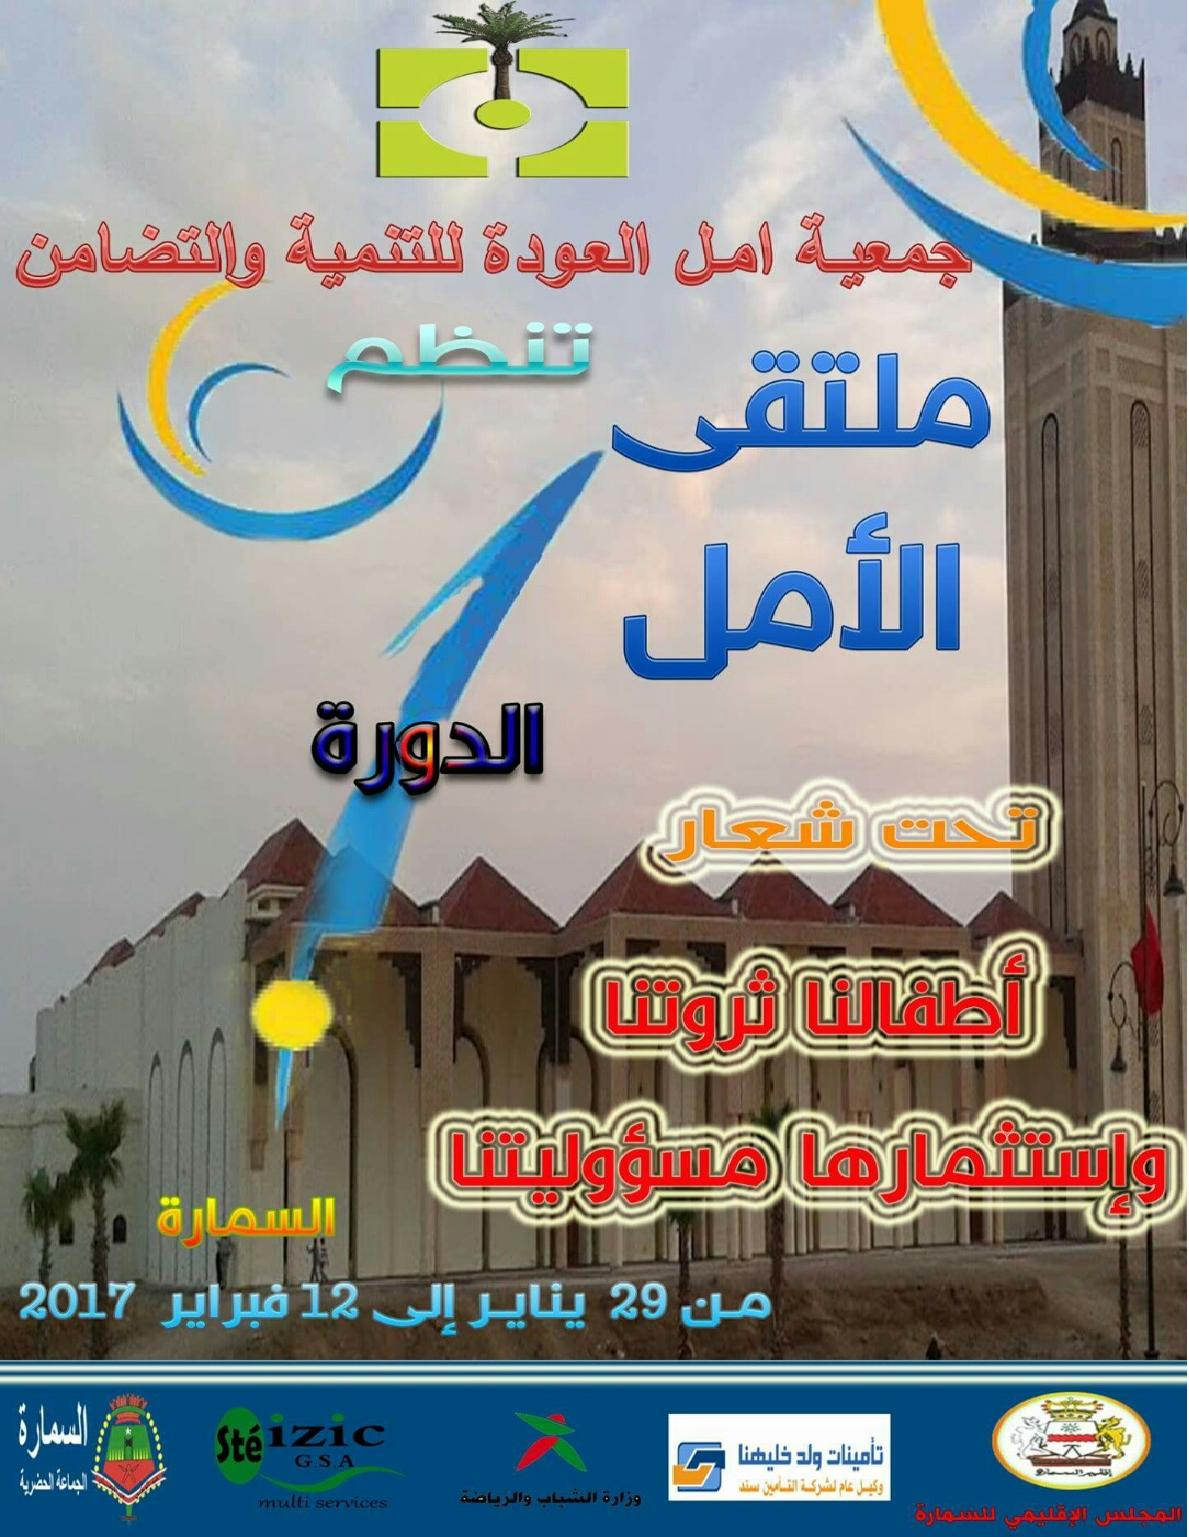 Photo of انطلاق فعاليات الدورة الأولى من ملتقى الأمل لجمعية أمل العودة للتنمية والتضامن بالسمارة